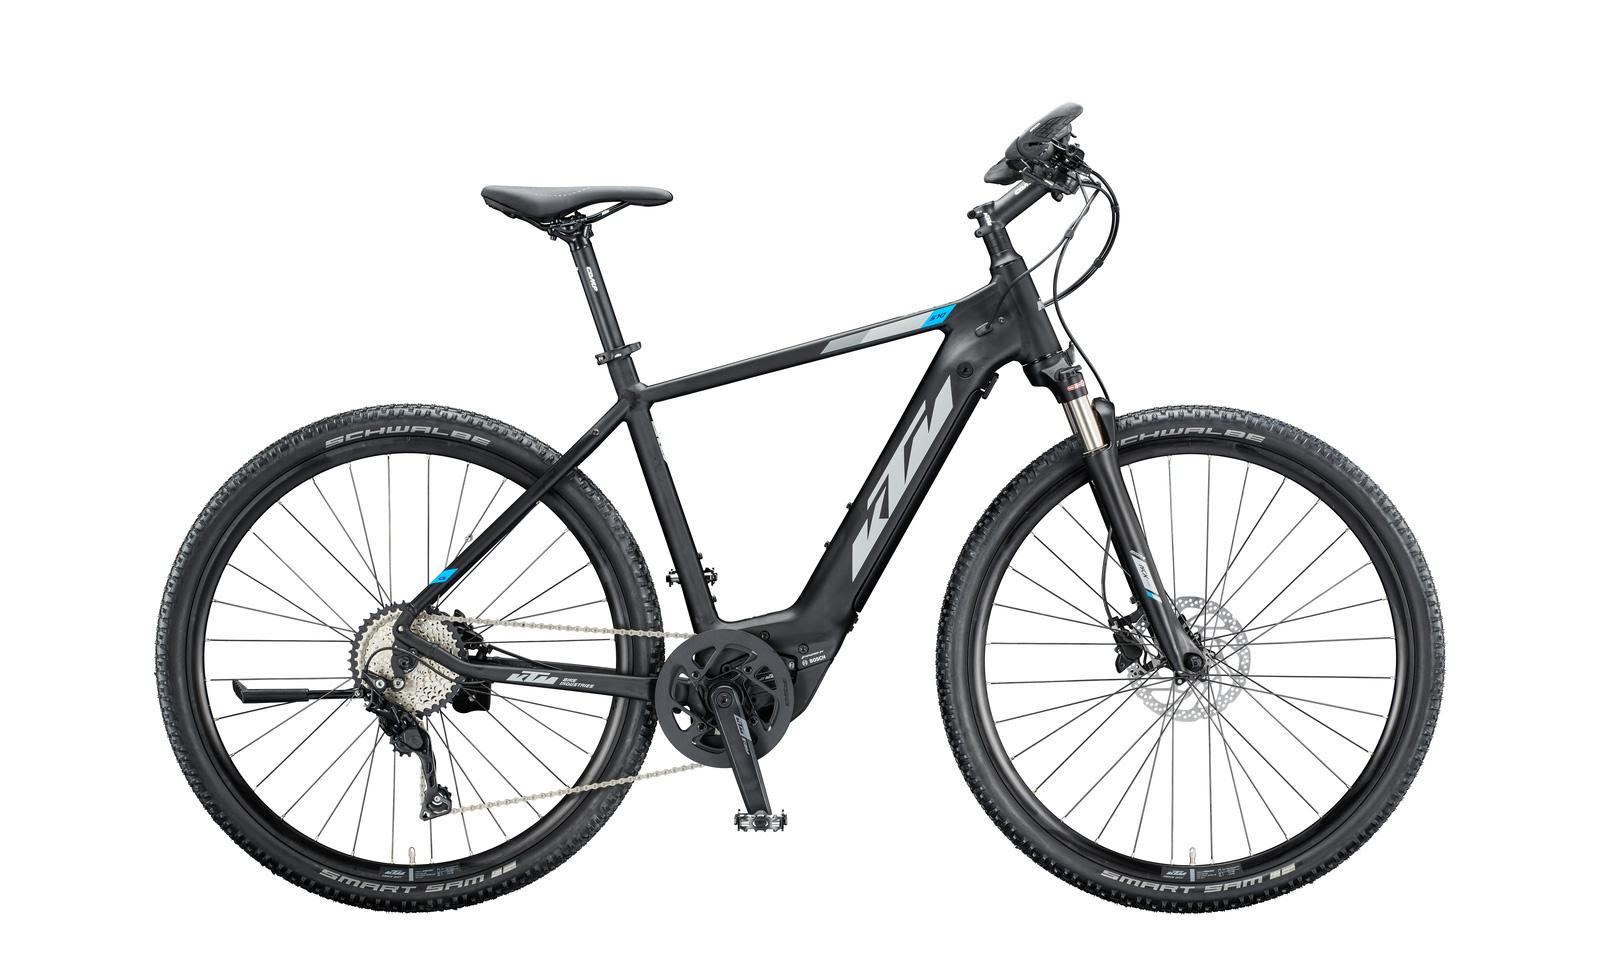 Biciclete electrice KTM E-Offroad MACINA CROSS 510 1x10 Shimano Deore